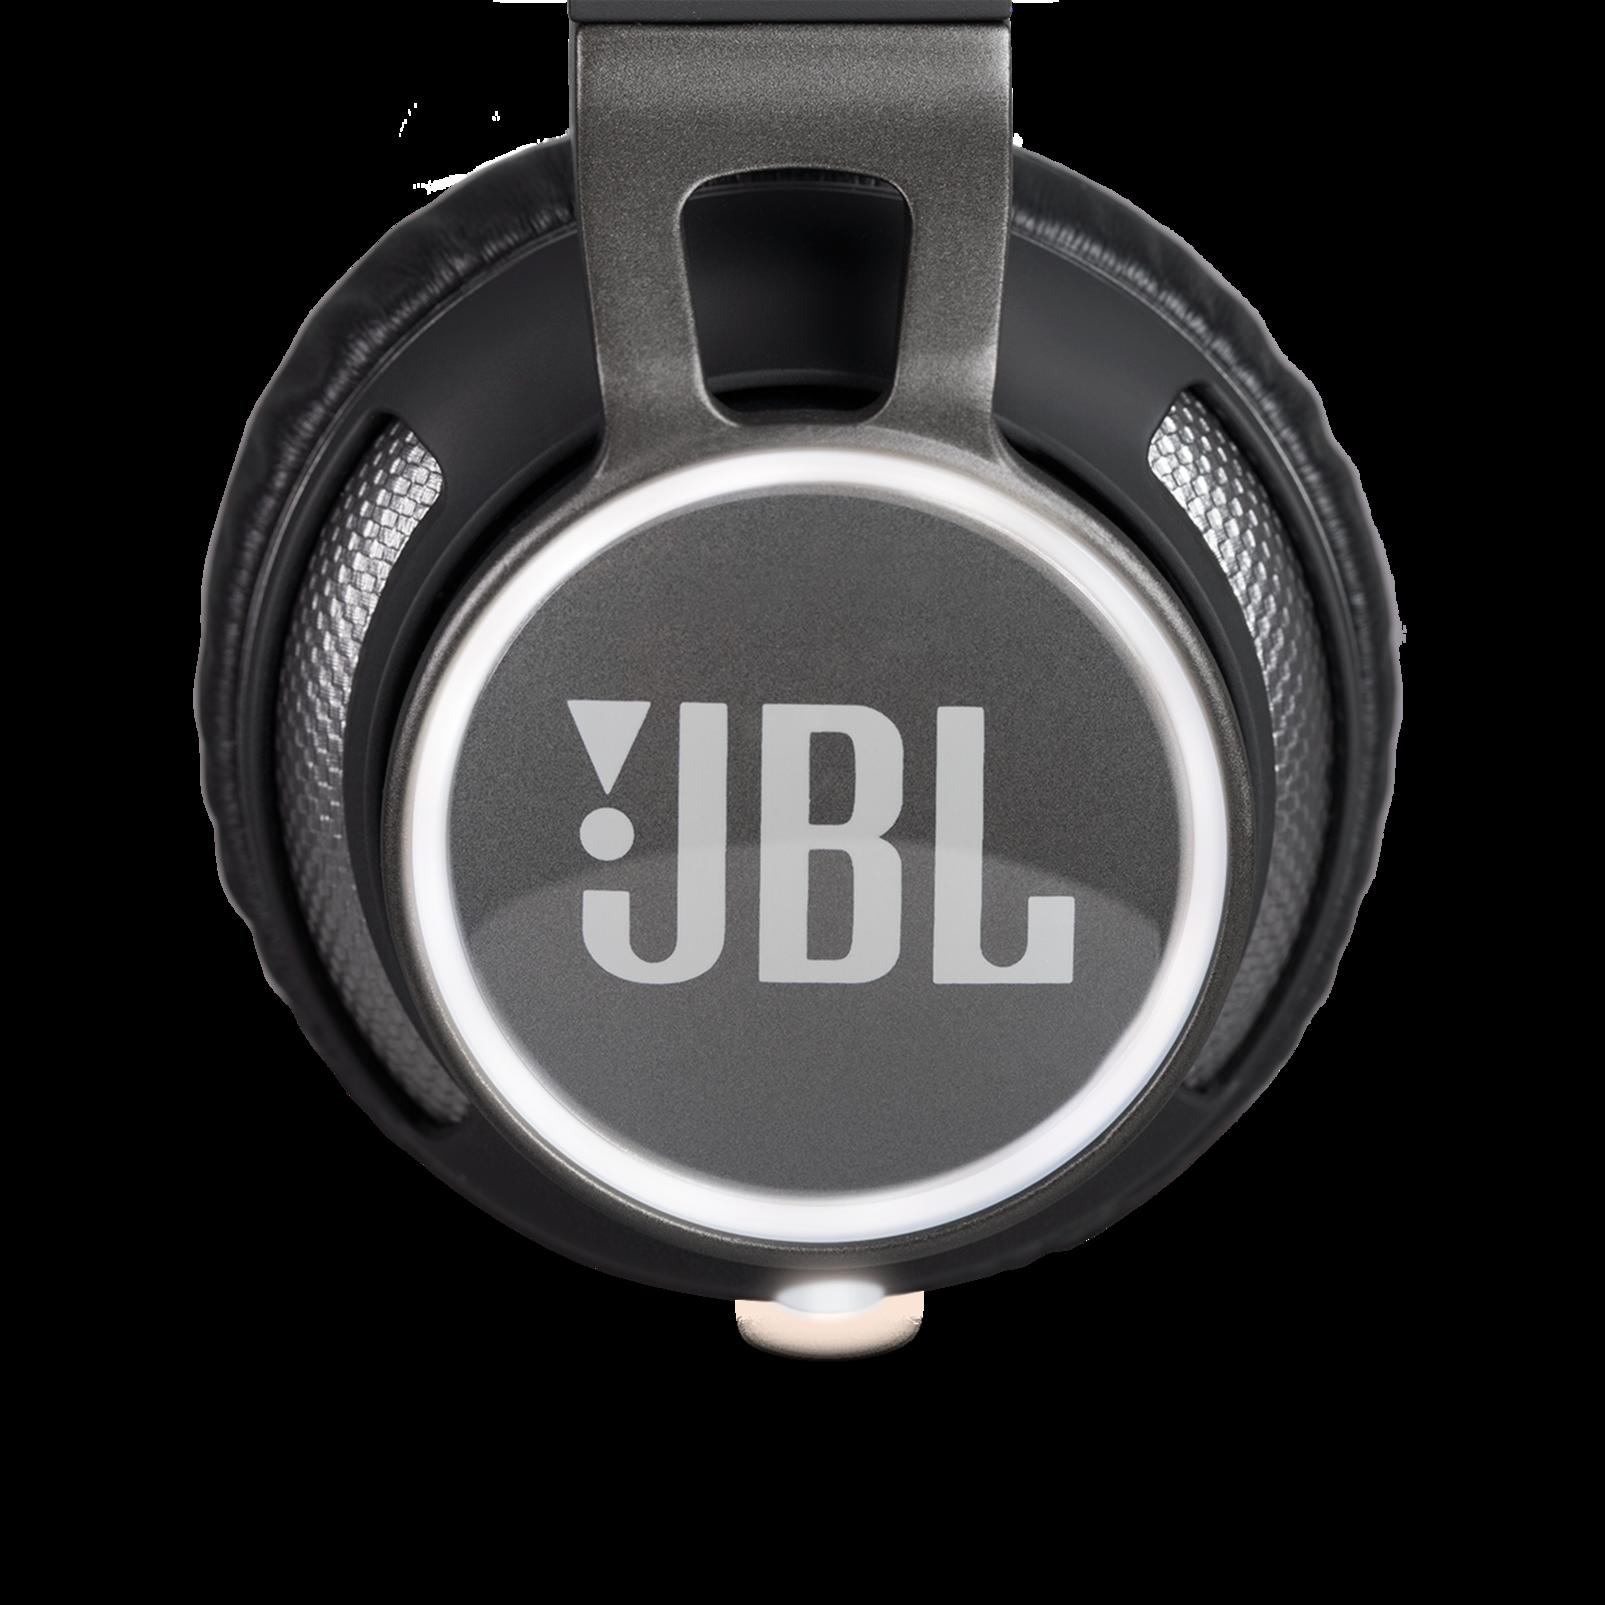 e09ecf8f5a7 Synchros S400BT | Premium On-ear Bluetooth® Stereo Headphone